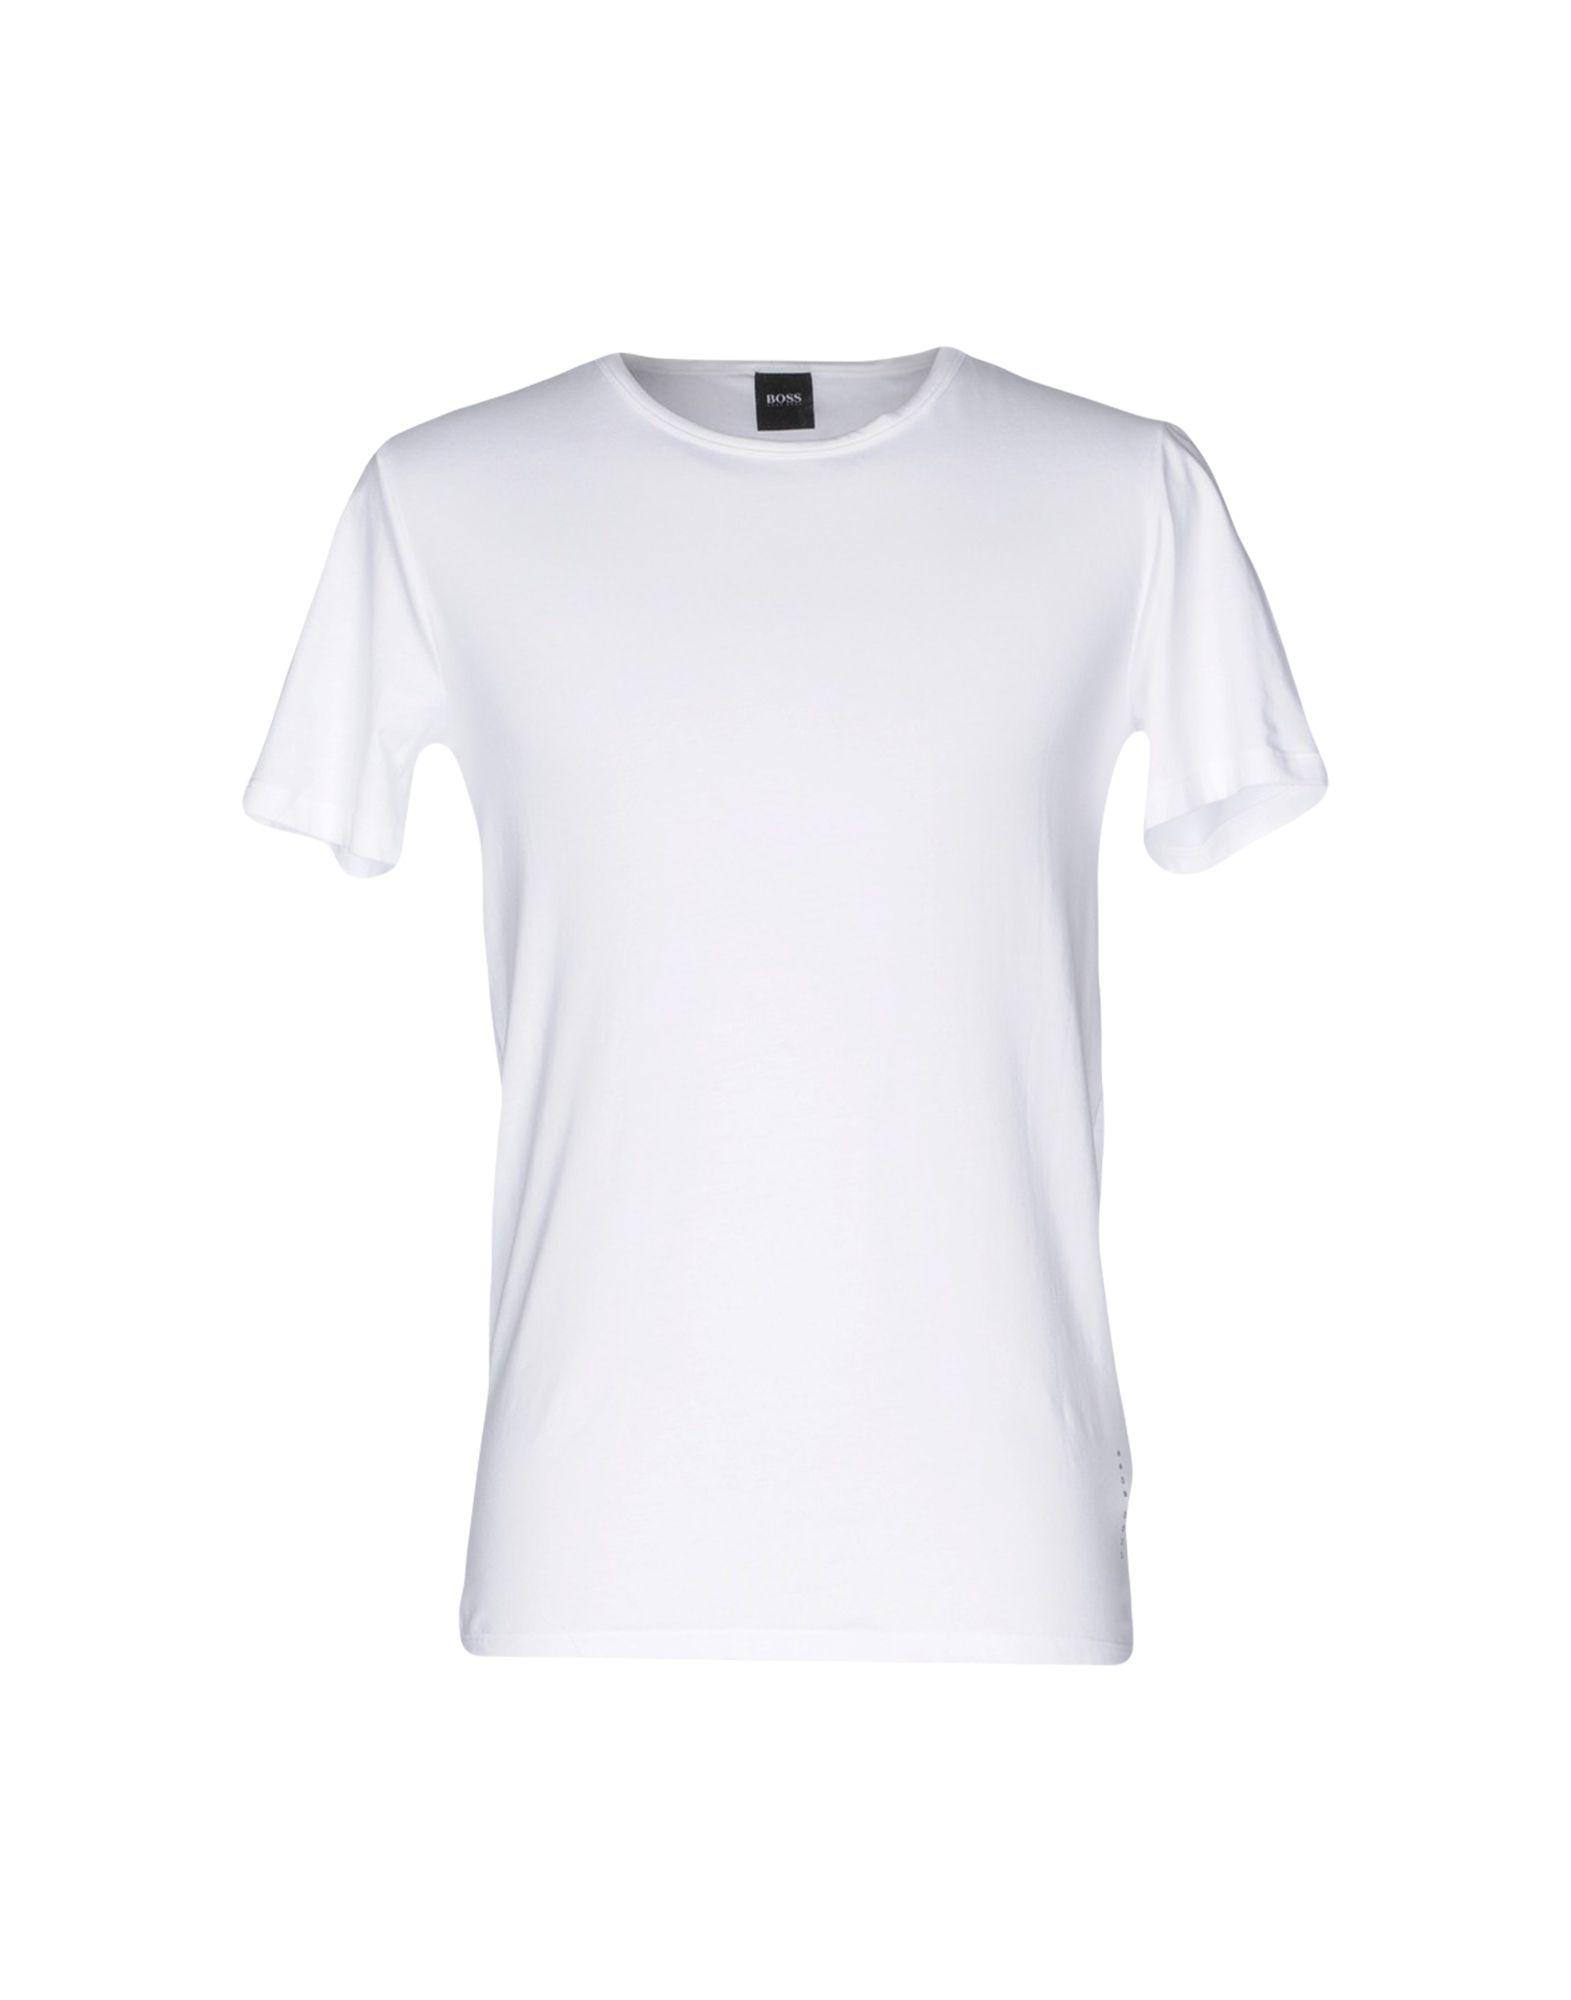 BOSS BLACK Undershirts